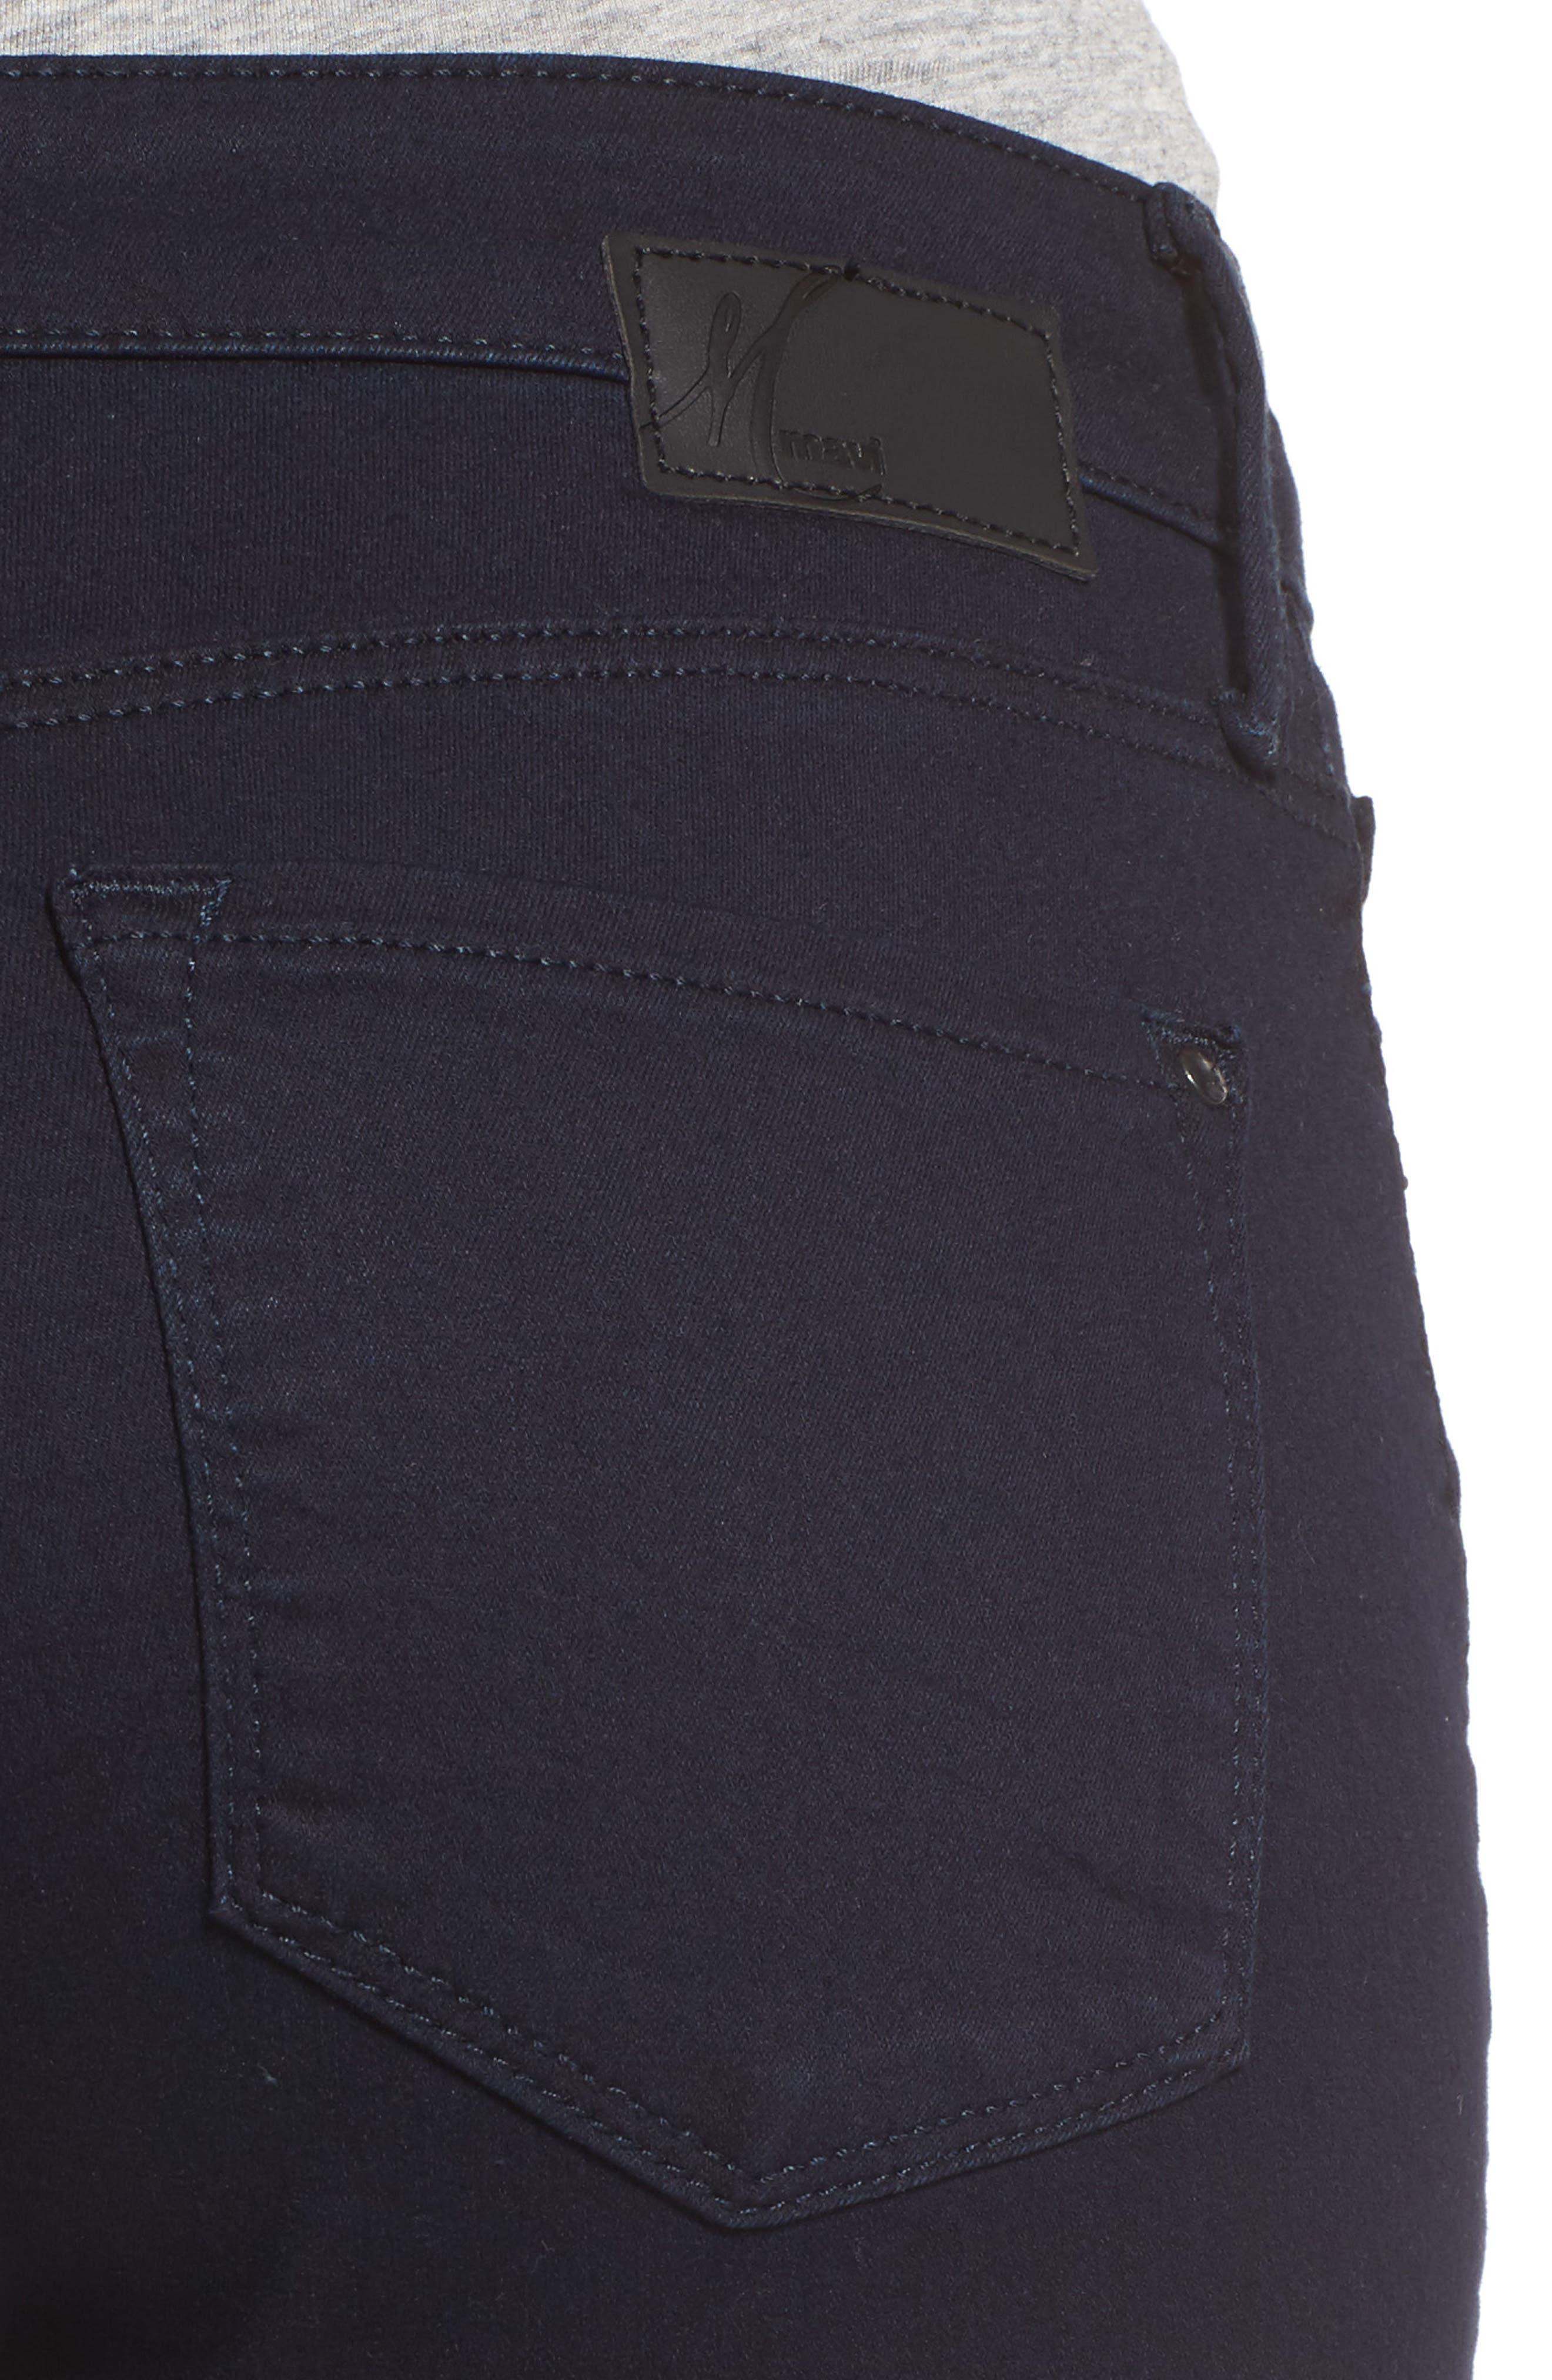 Alternate Image 4  - Mavi Jeans 'Alexa' Midrise Skinny Jeans (Dark Shanty)